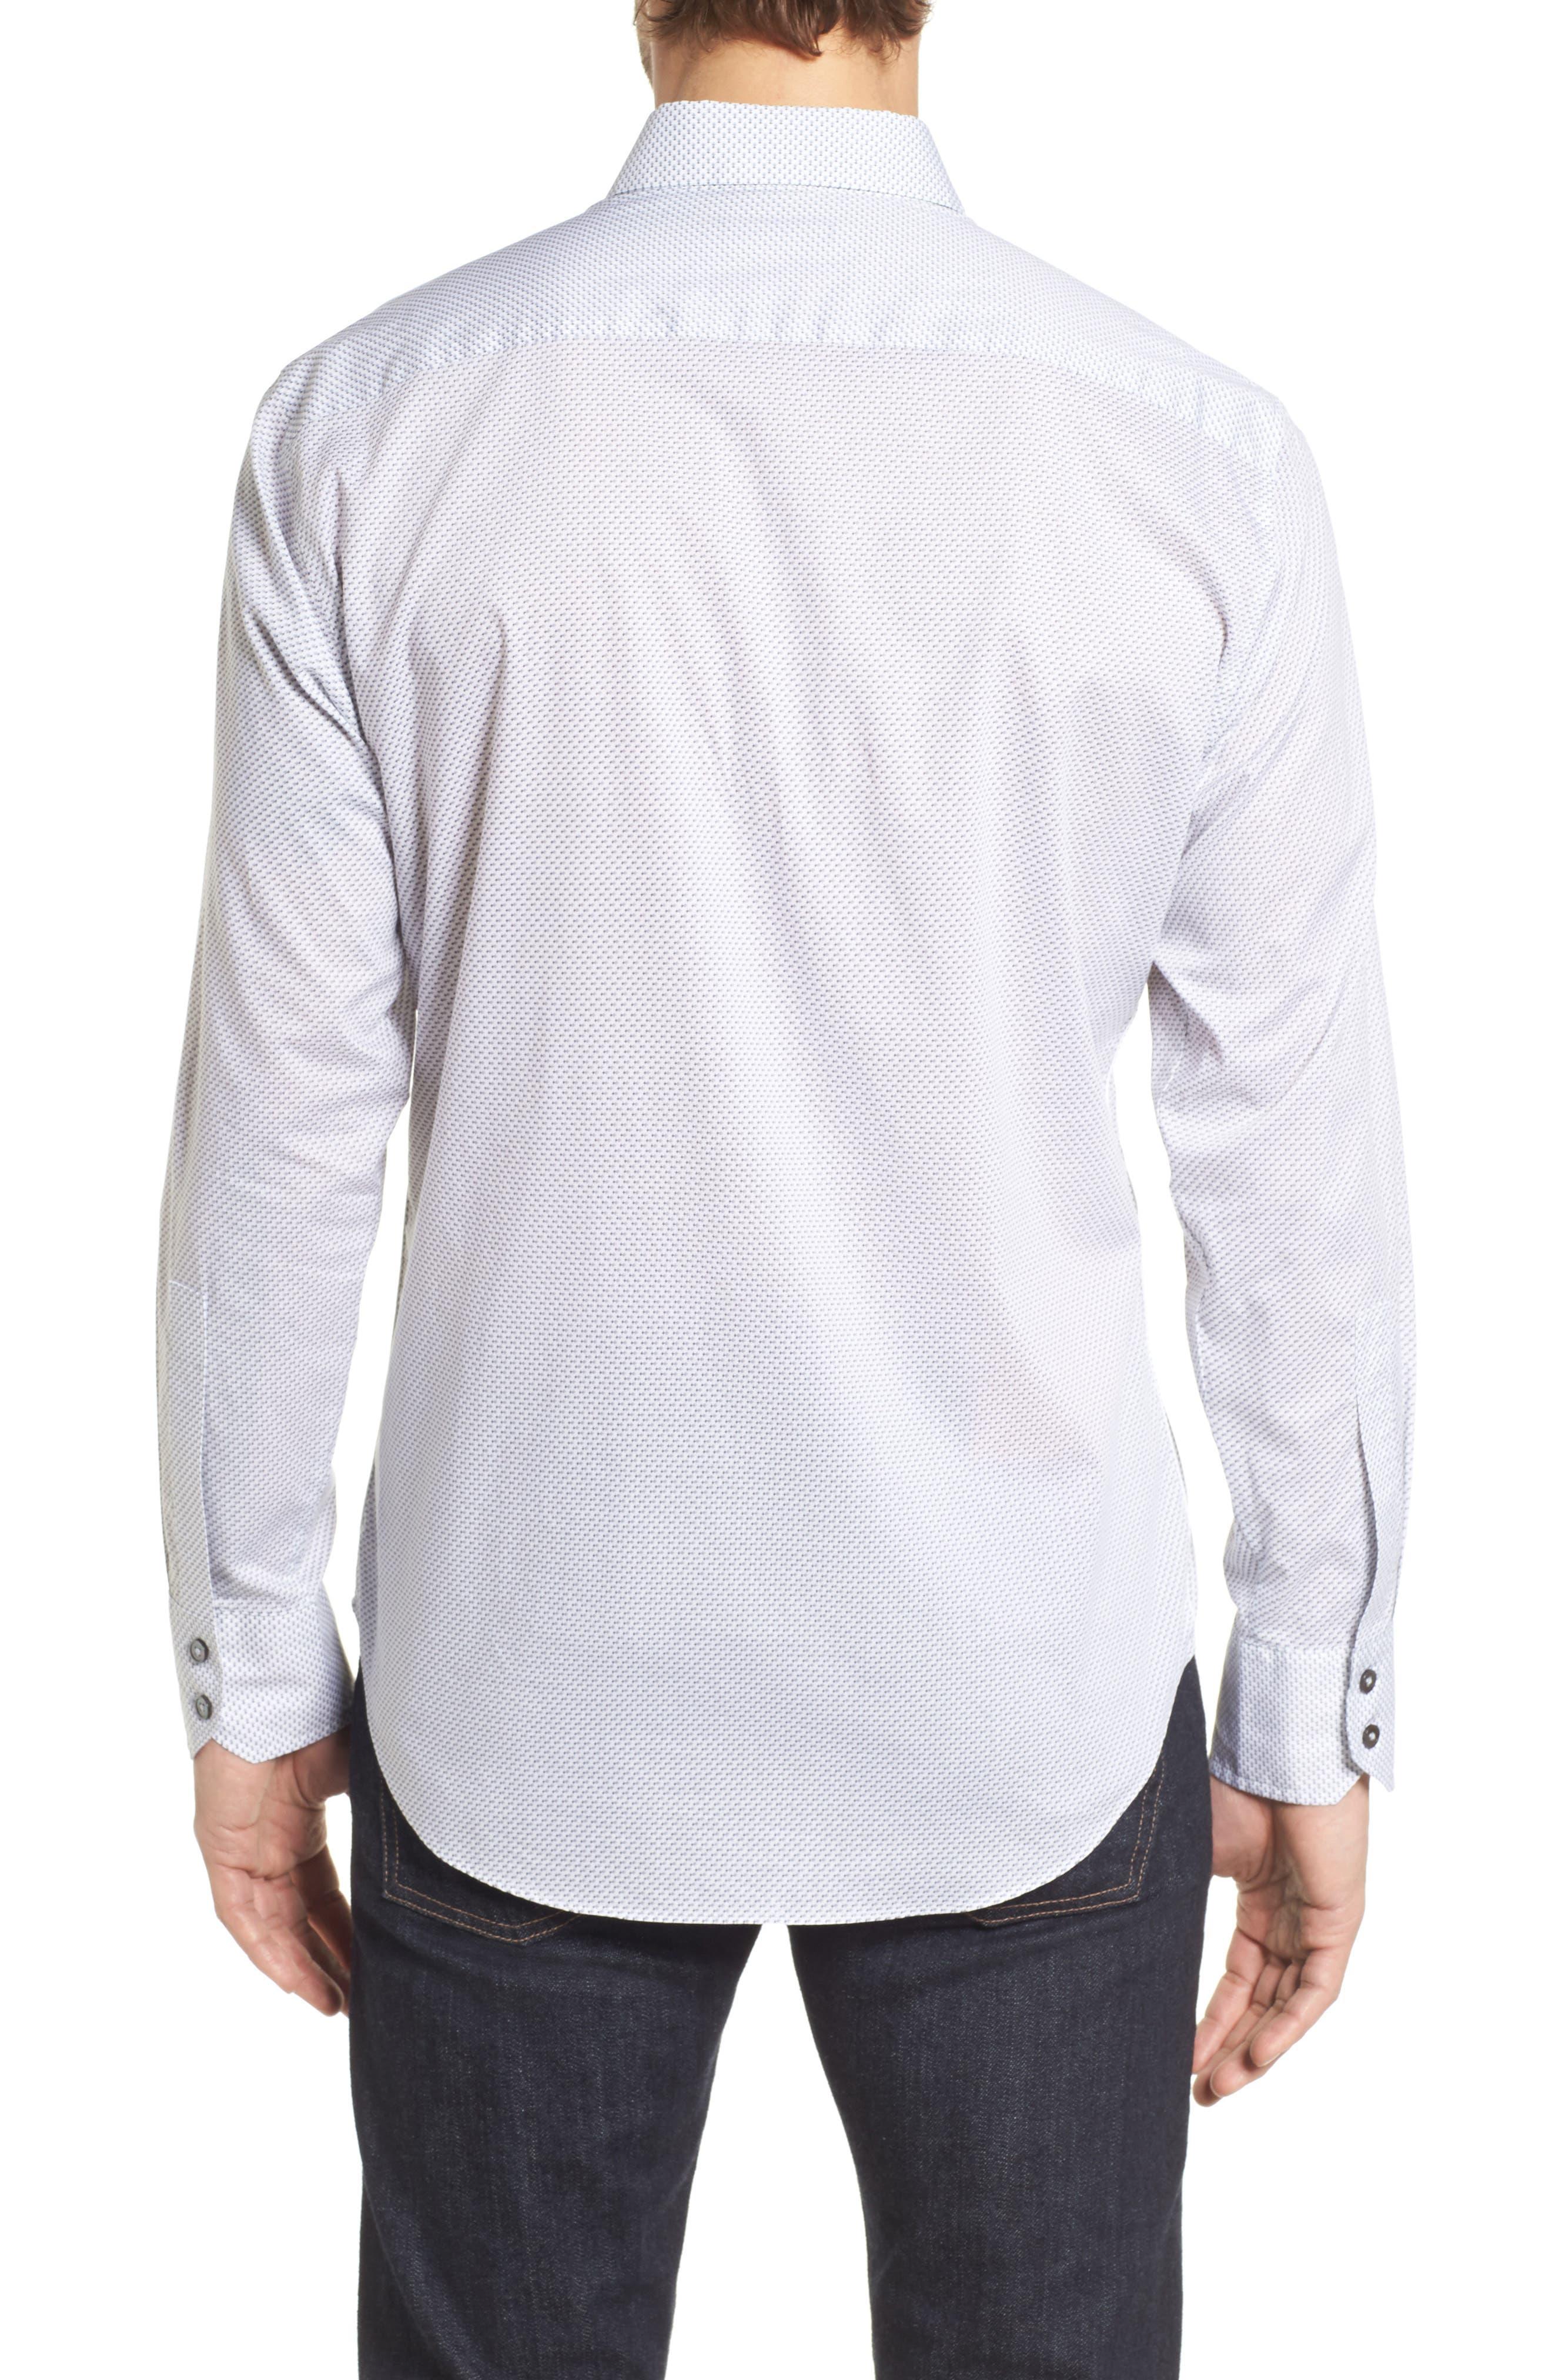 Watts Arrow Print Sport Shirt,                             Alternate thumbnail 2, color,                             020